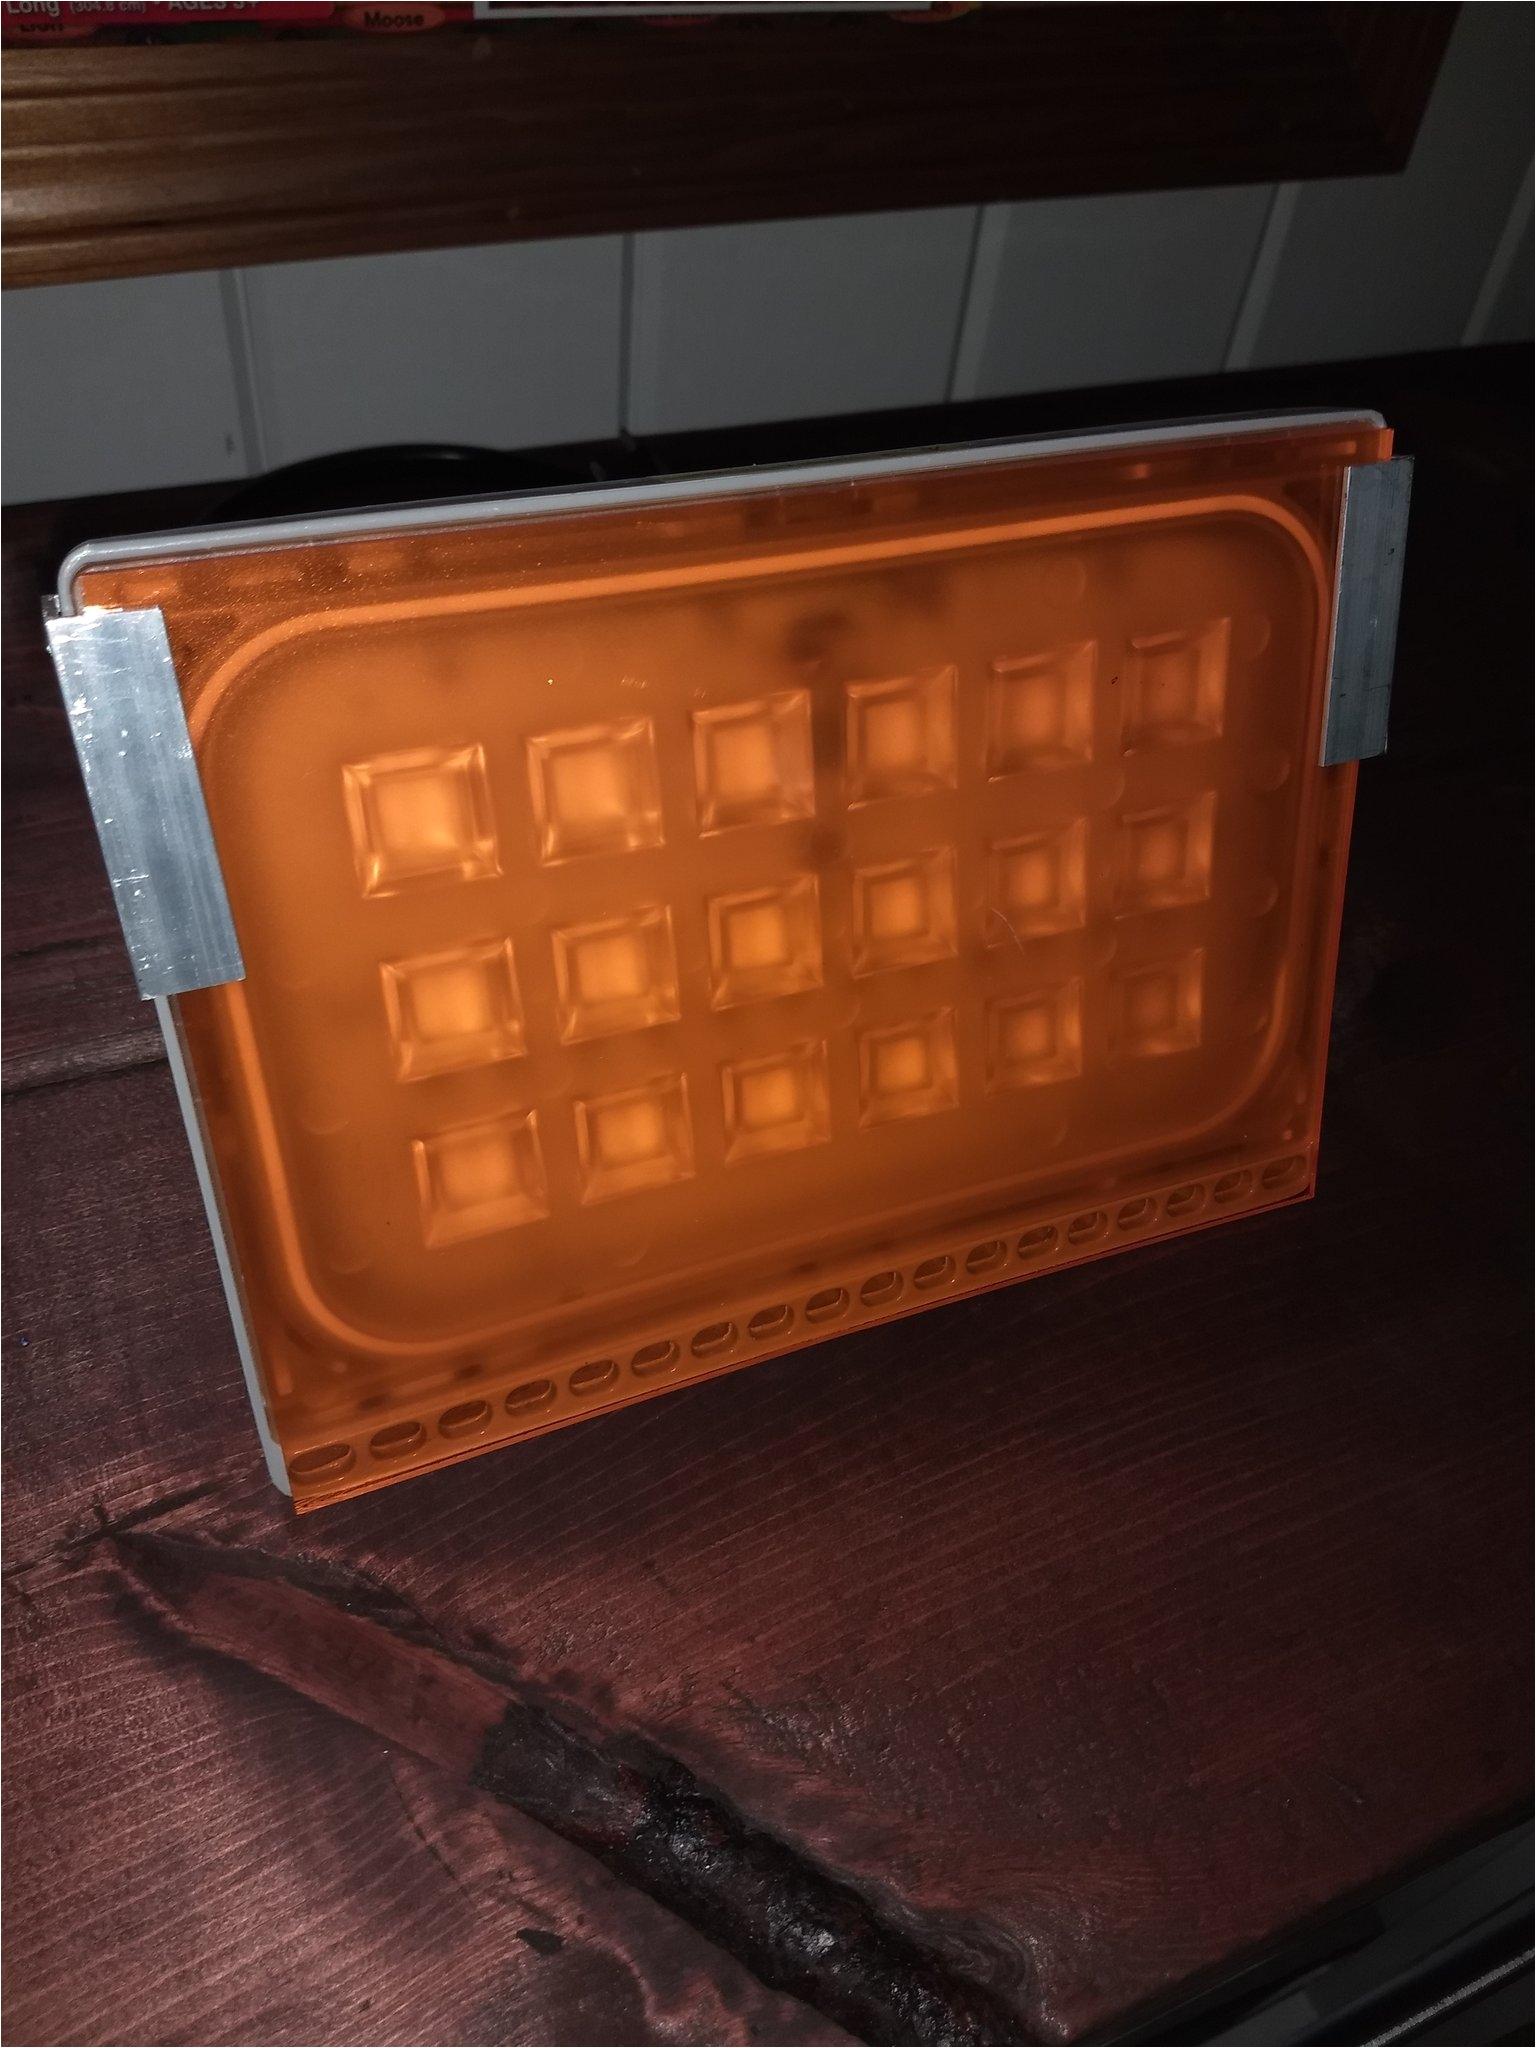 next generation leds 50w led bowfishing flood light 110v ac hps amber filter